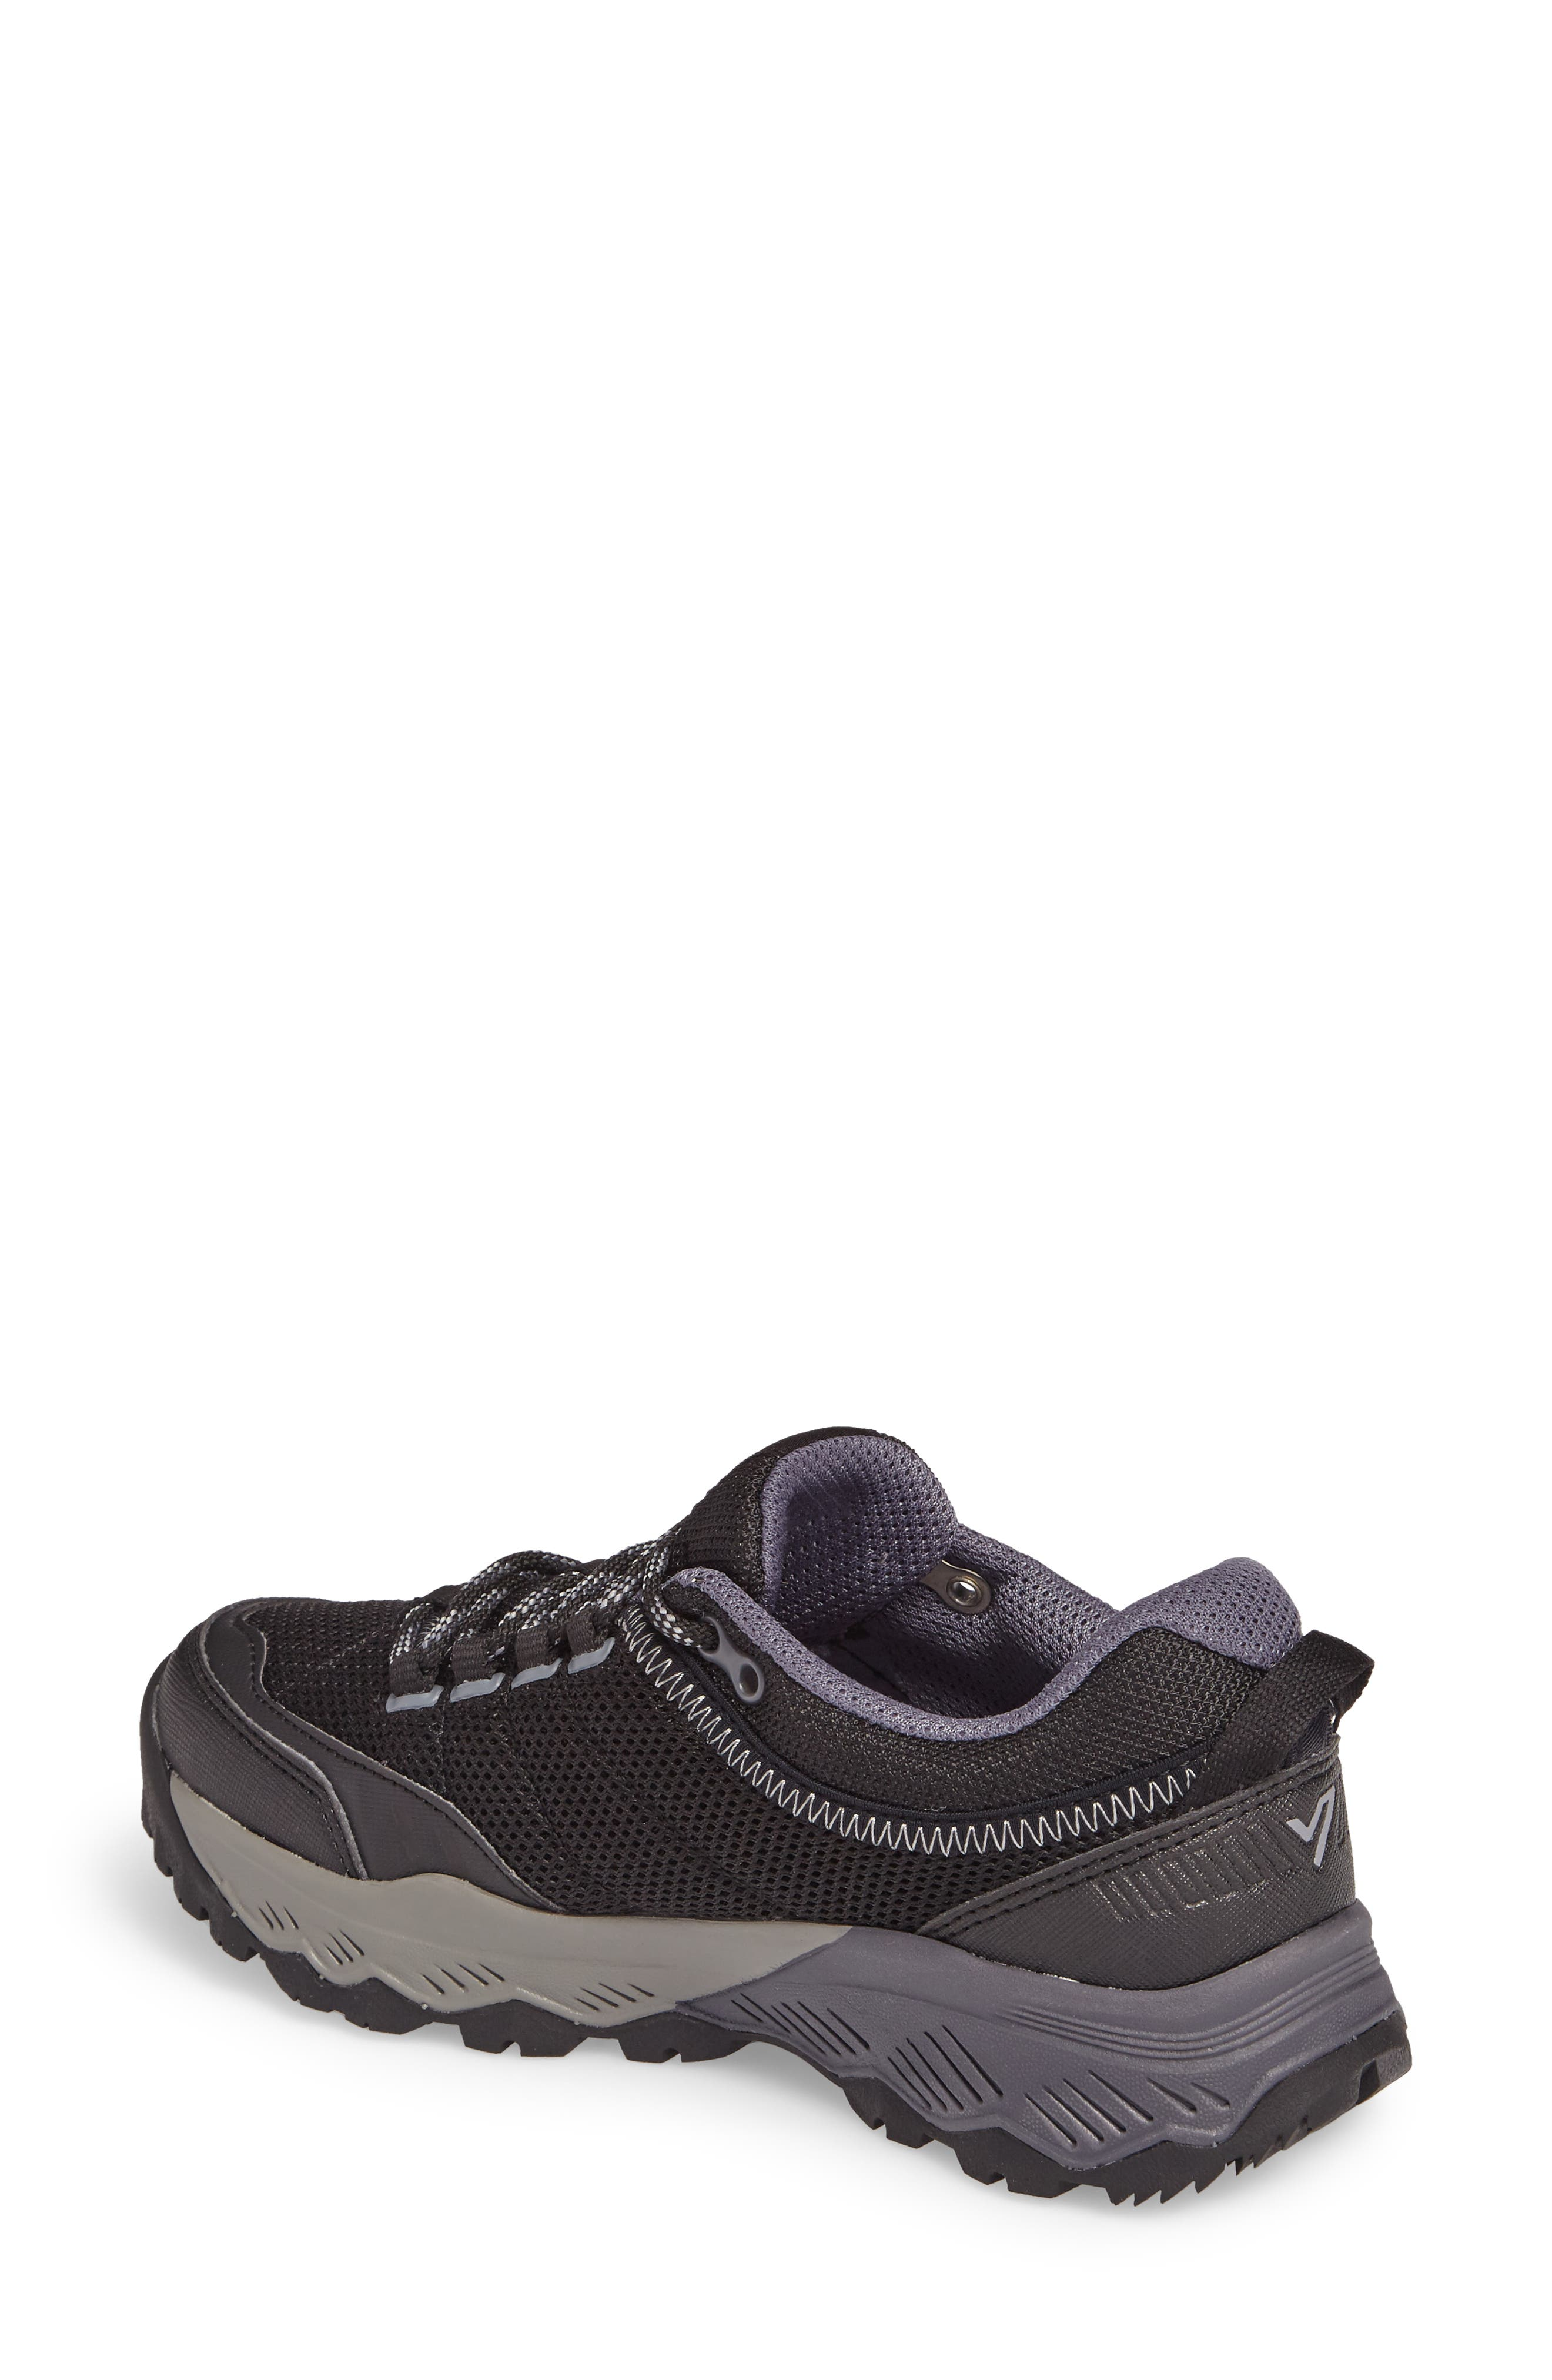 Mckinley Sneaker,                             Alternate thumbnail 2, color,                             001